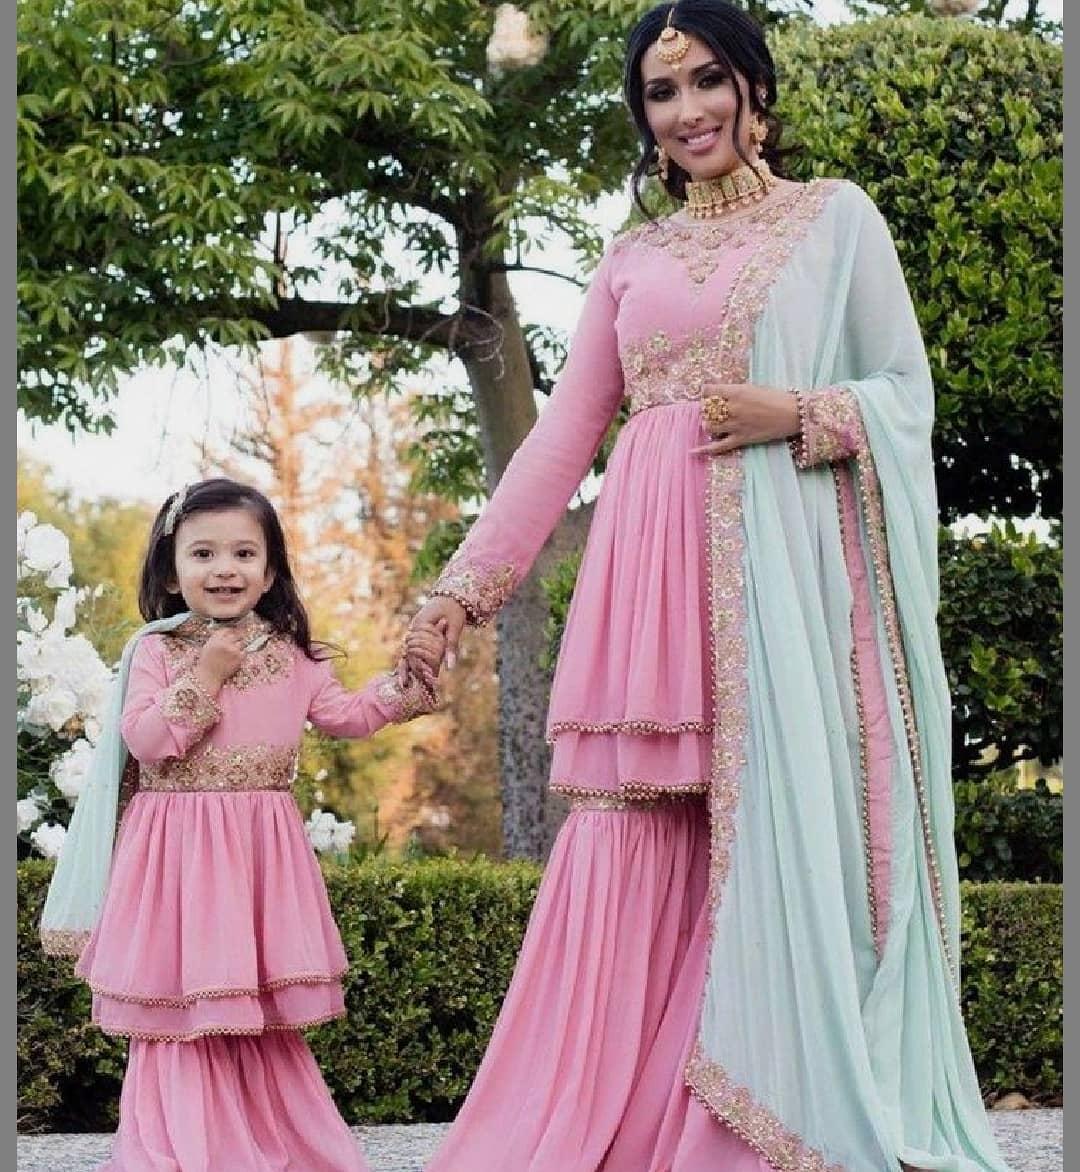 mother daughter duo dresses